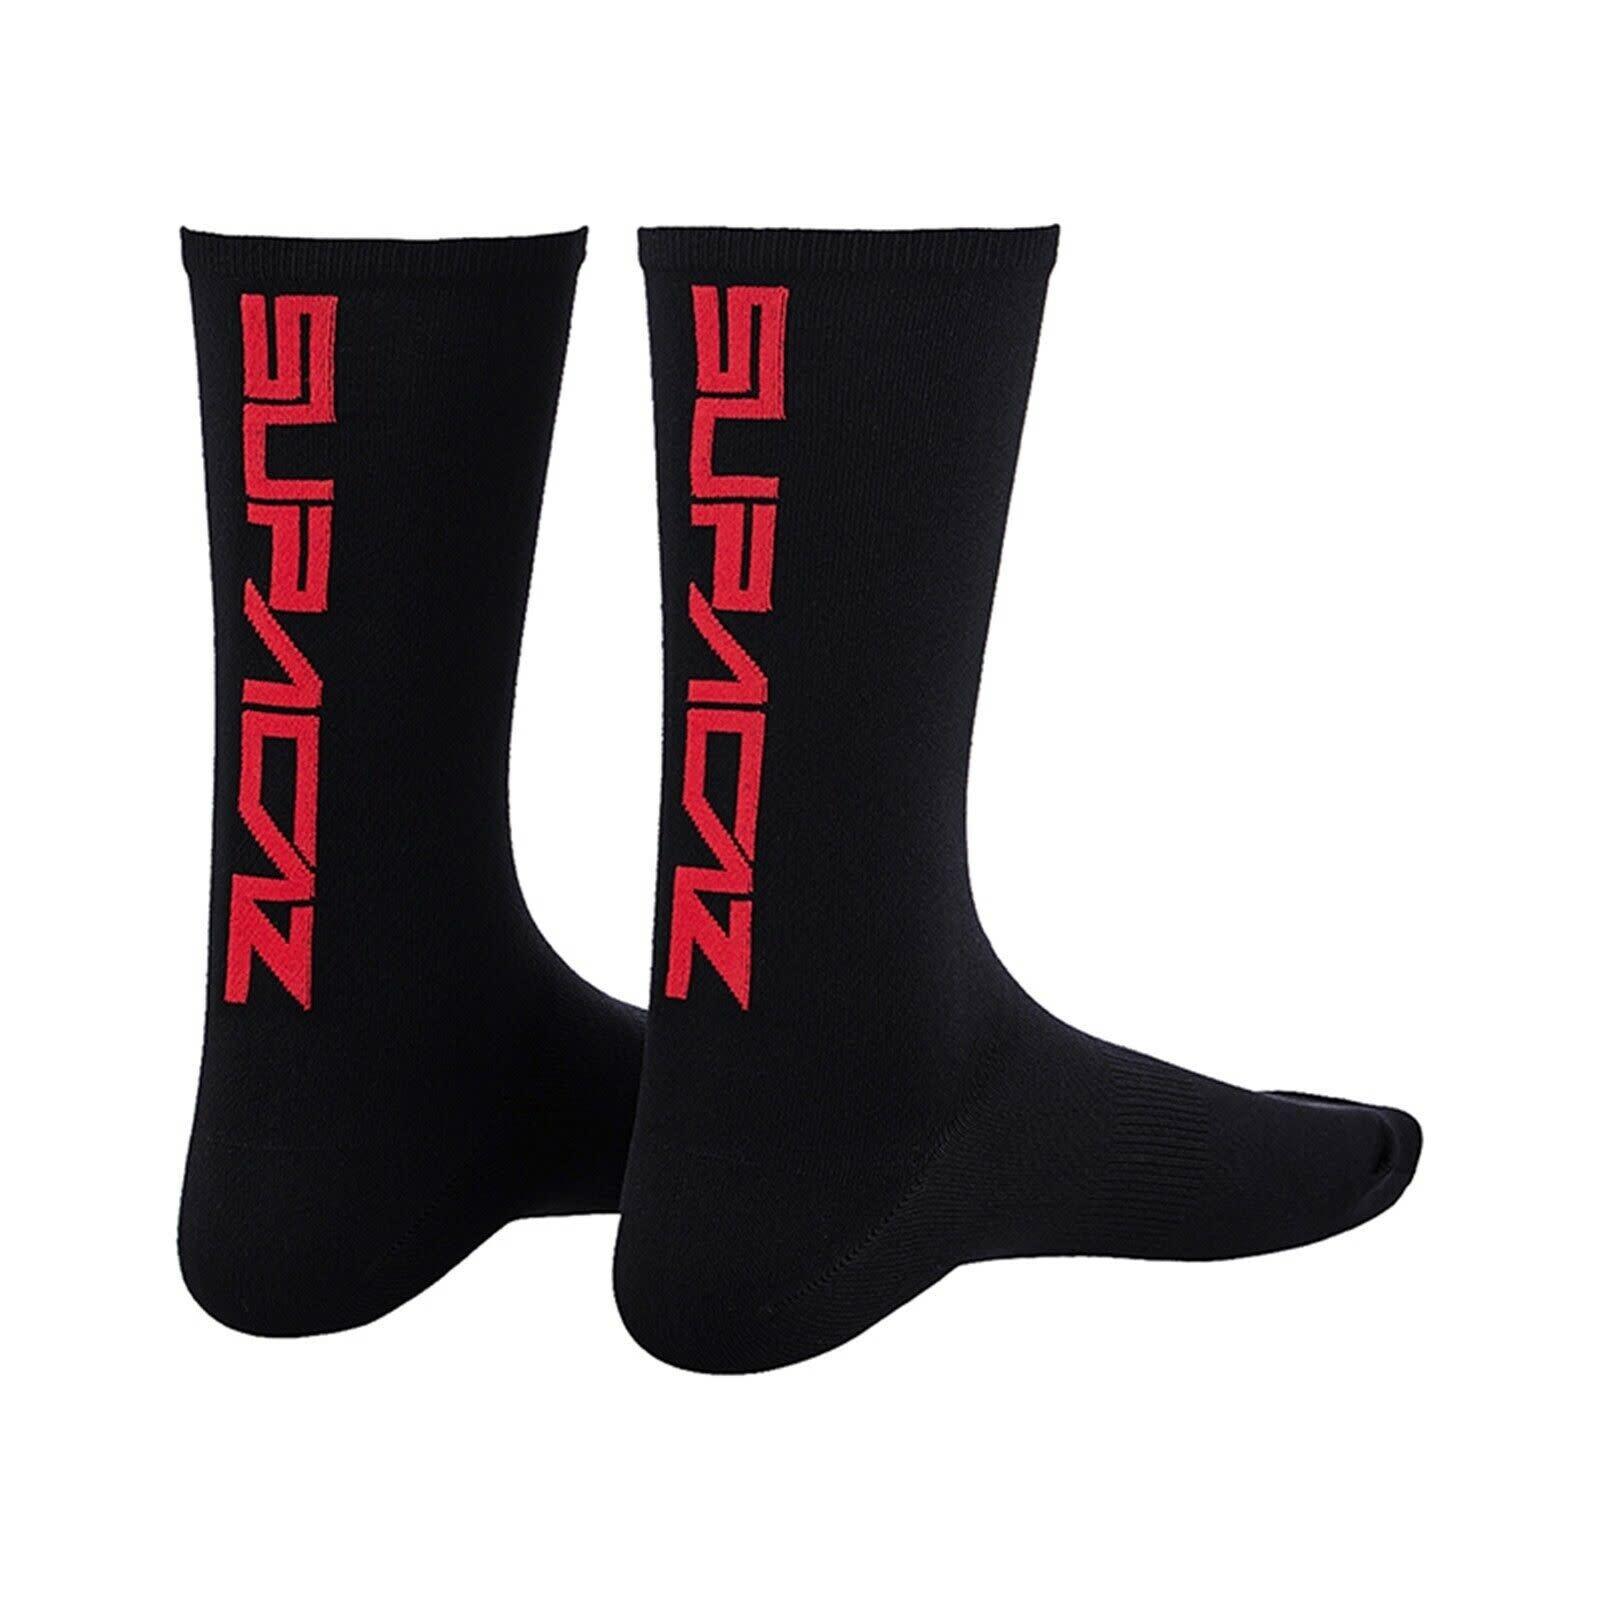 Supacaz Supacaz, Straight Up, Socks, Black/Red, LXL, Pair